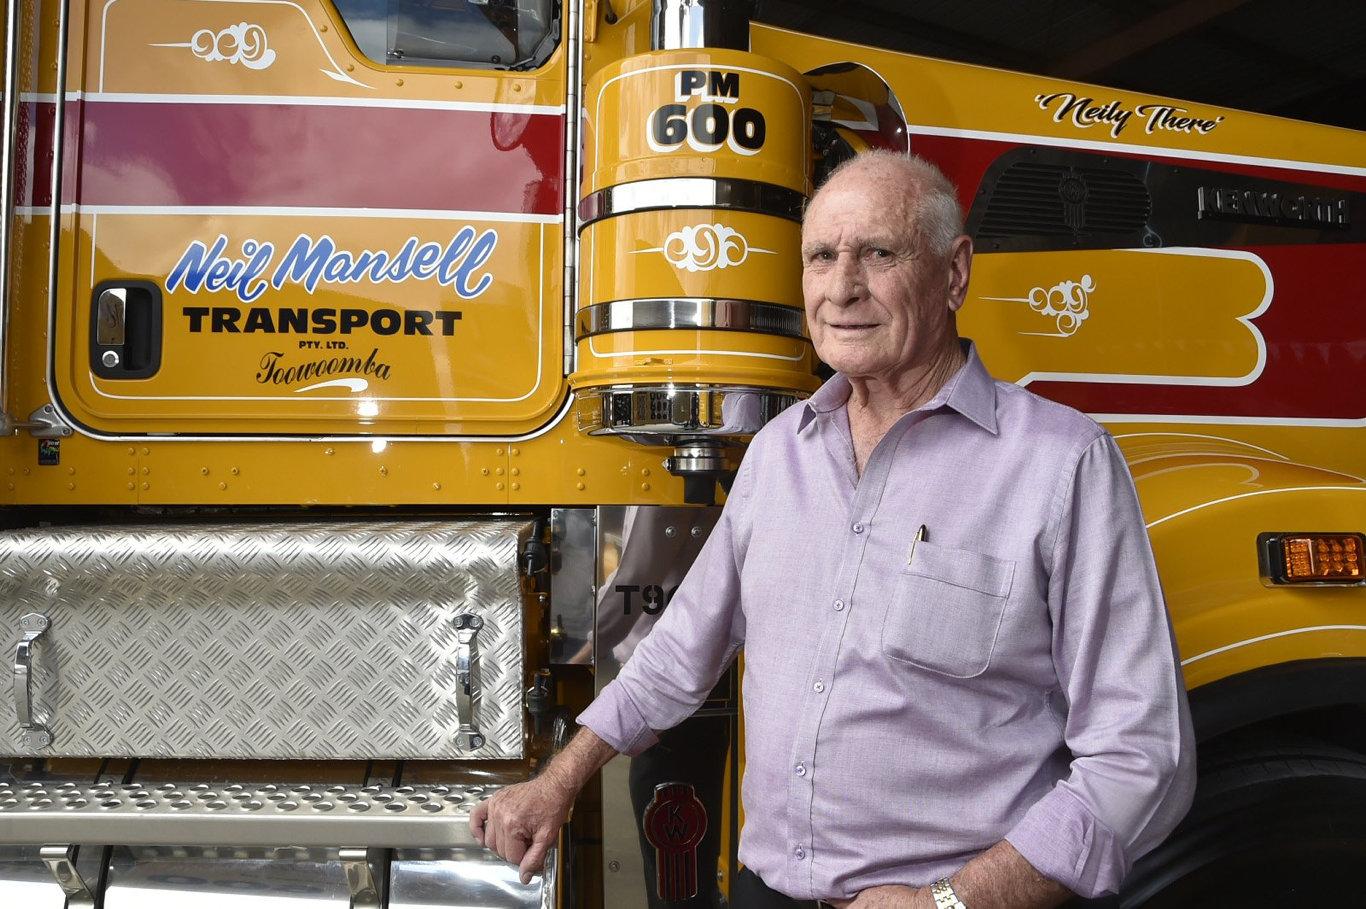 Australian Transport Industry Icon Neil Mansell